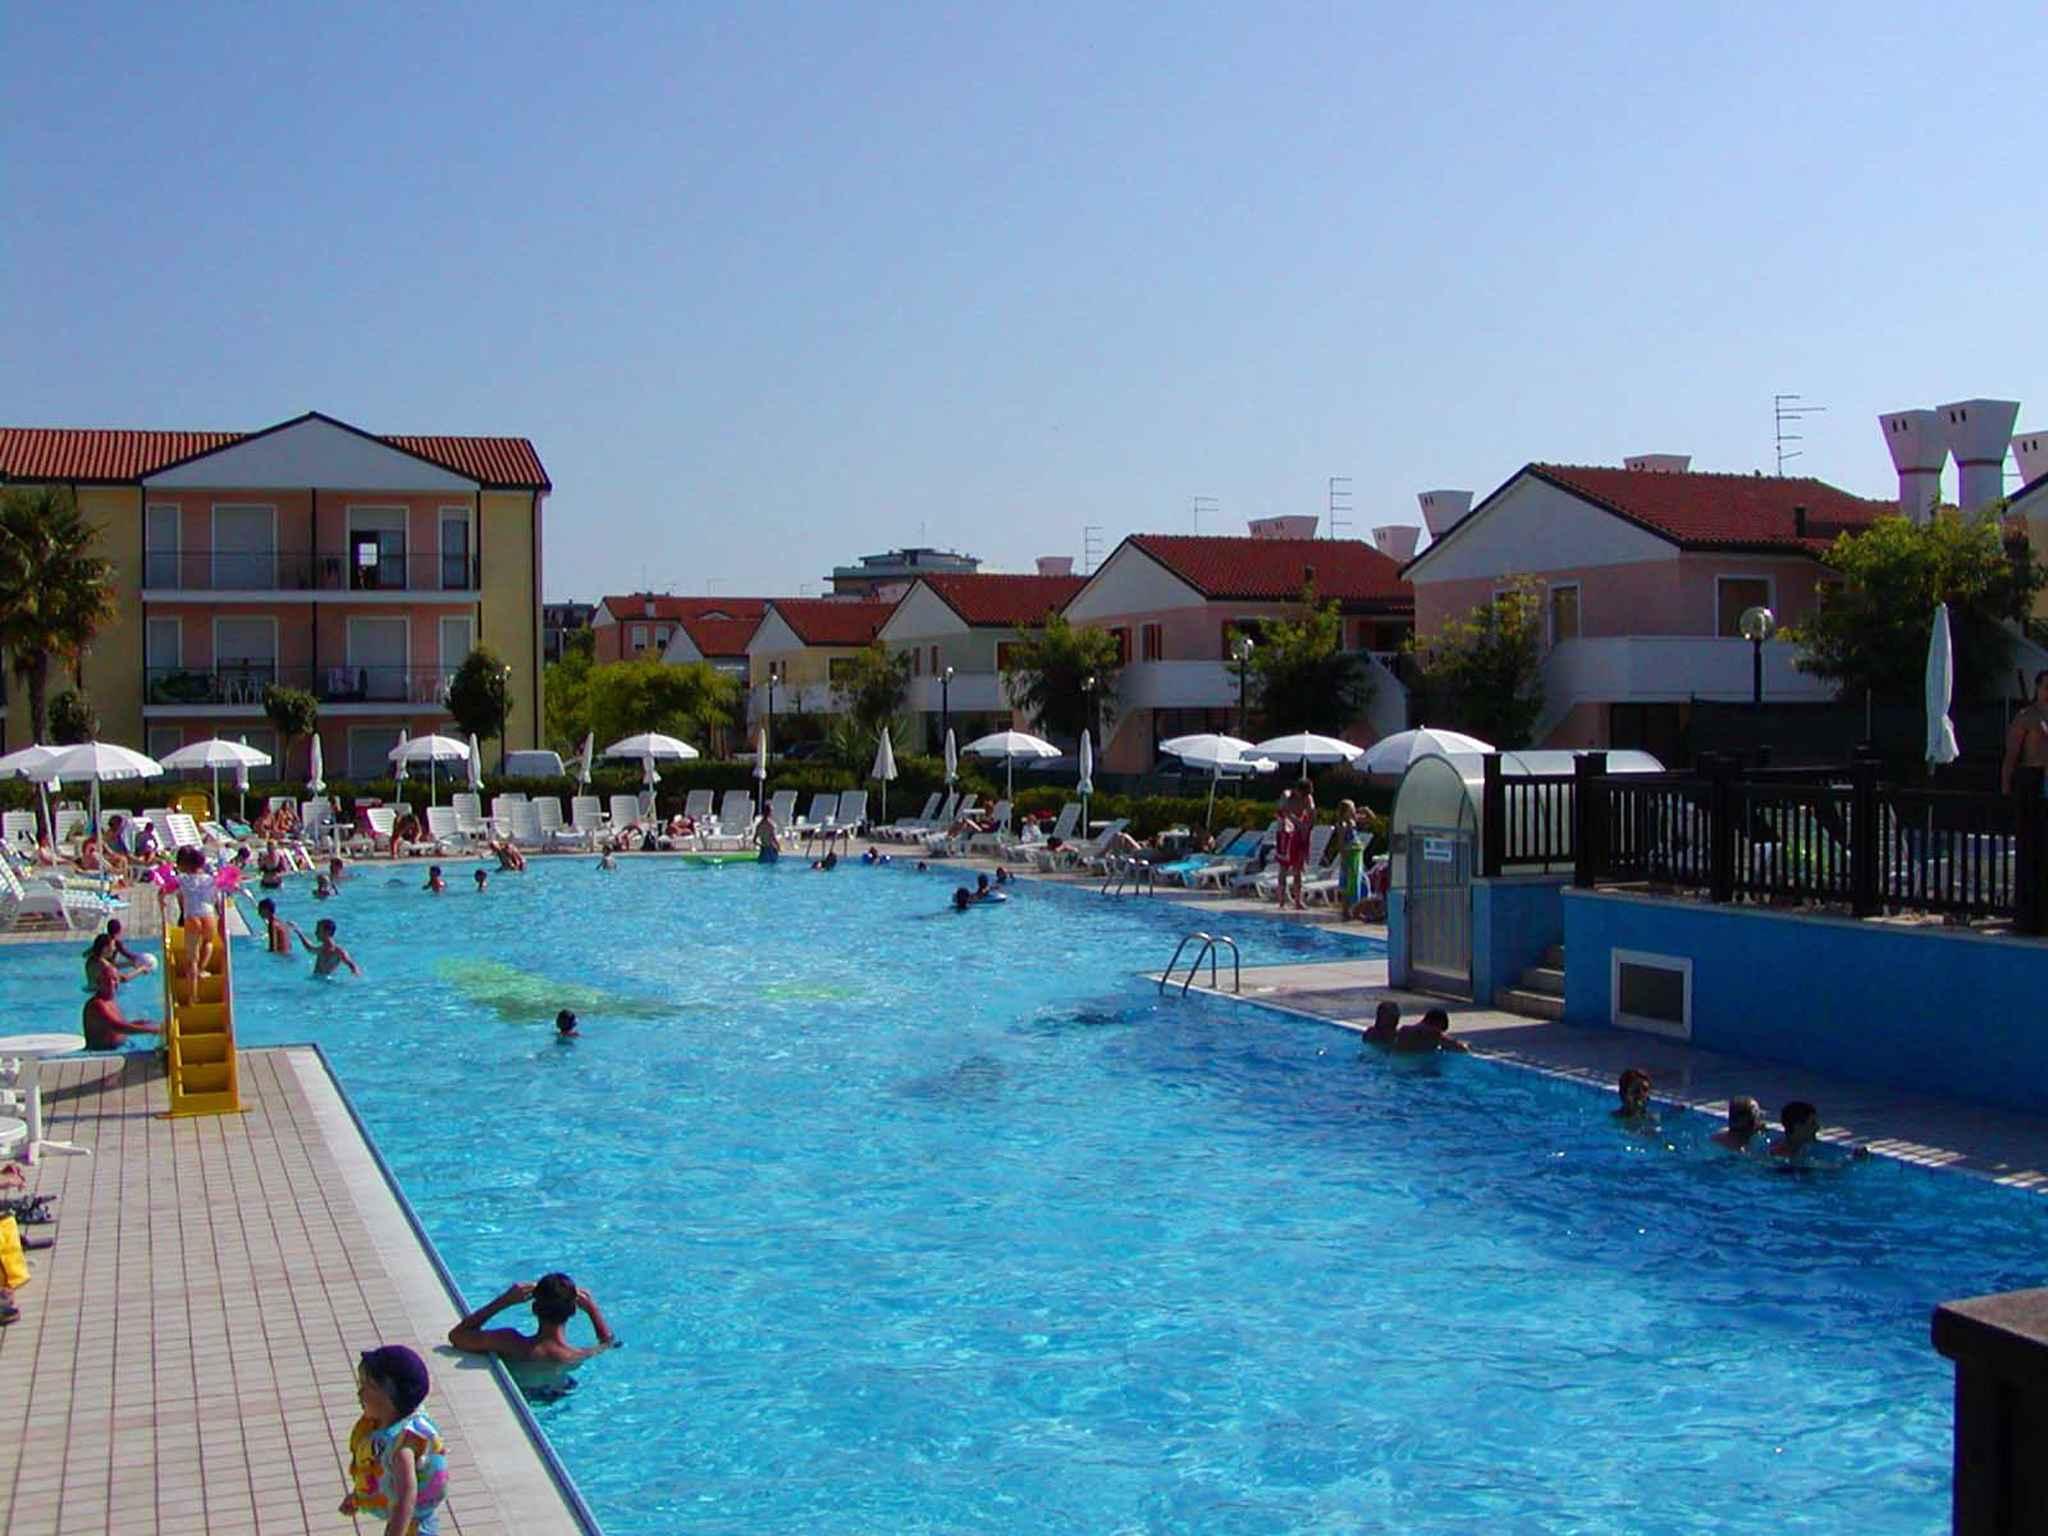 Ferienhaus mit Pool und Grill (284304), Rosolina Mare, Rovigo, Venetien, Italien, Bild 11